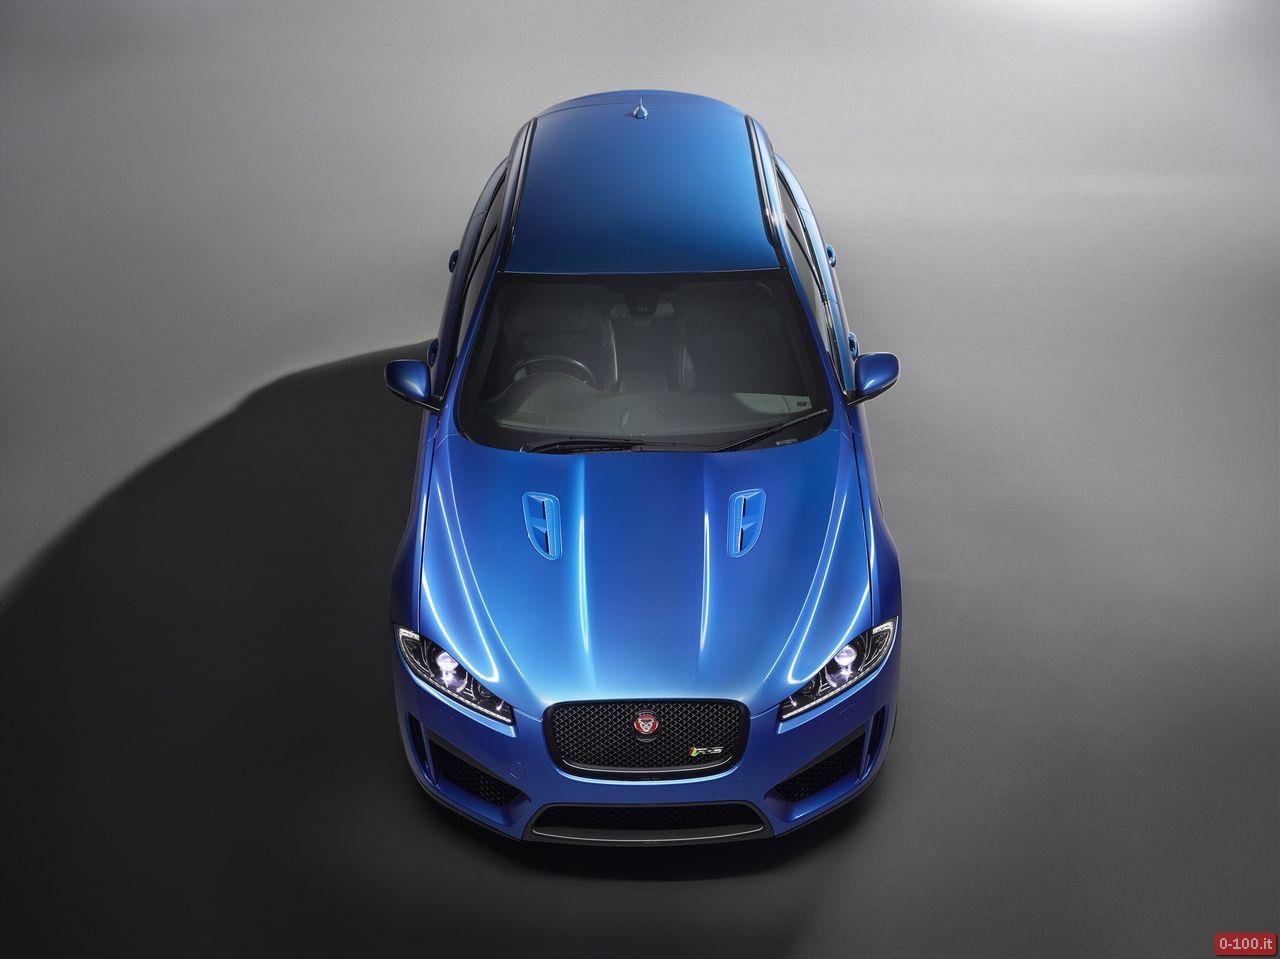 ginevra-2014-jaguar-xf-model-year-2015-xfr-s-sportbrake-0-100_7